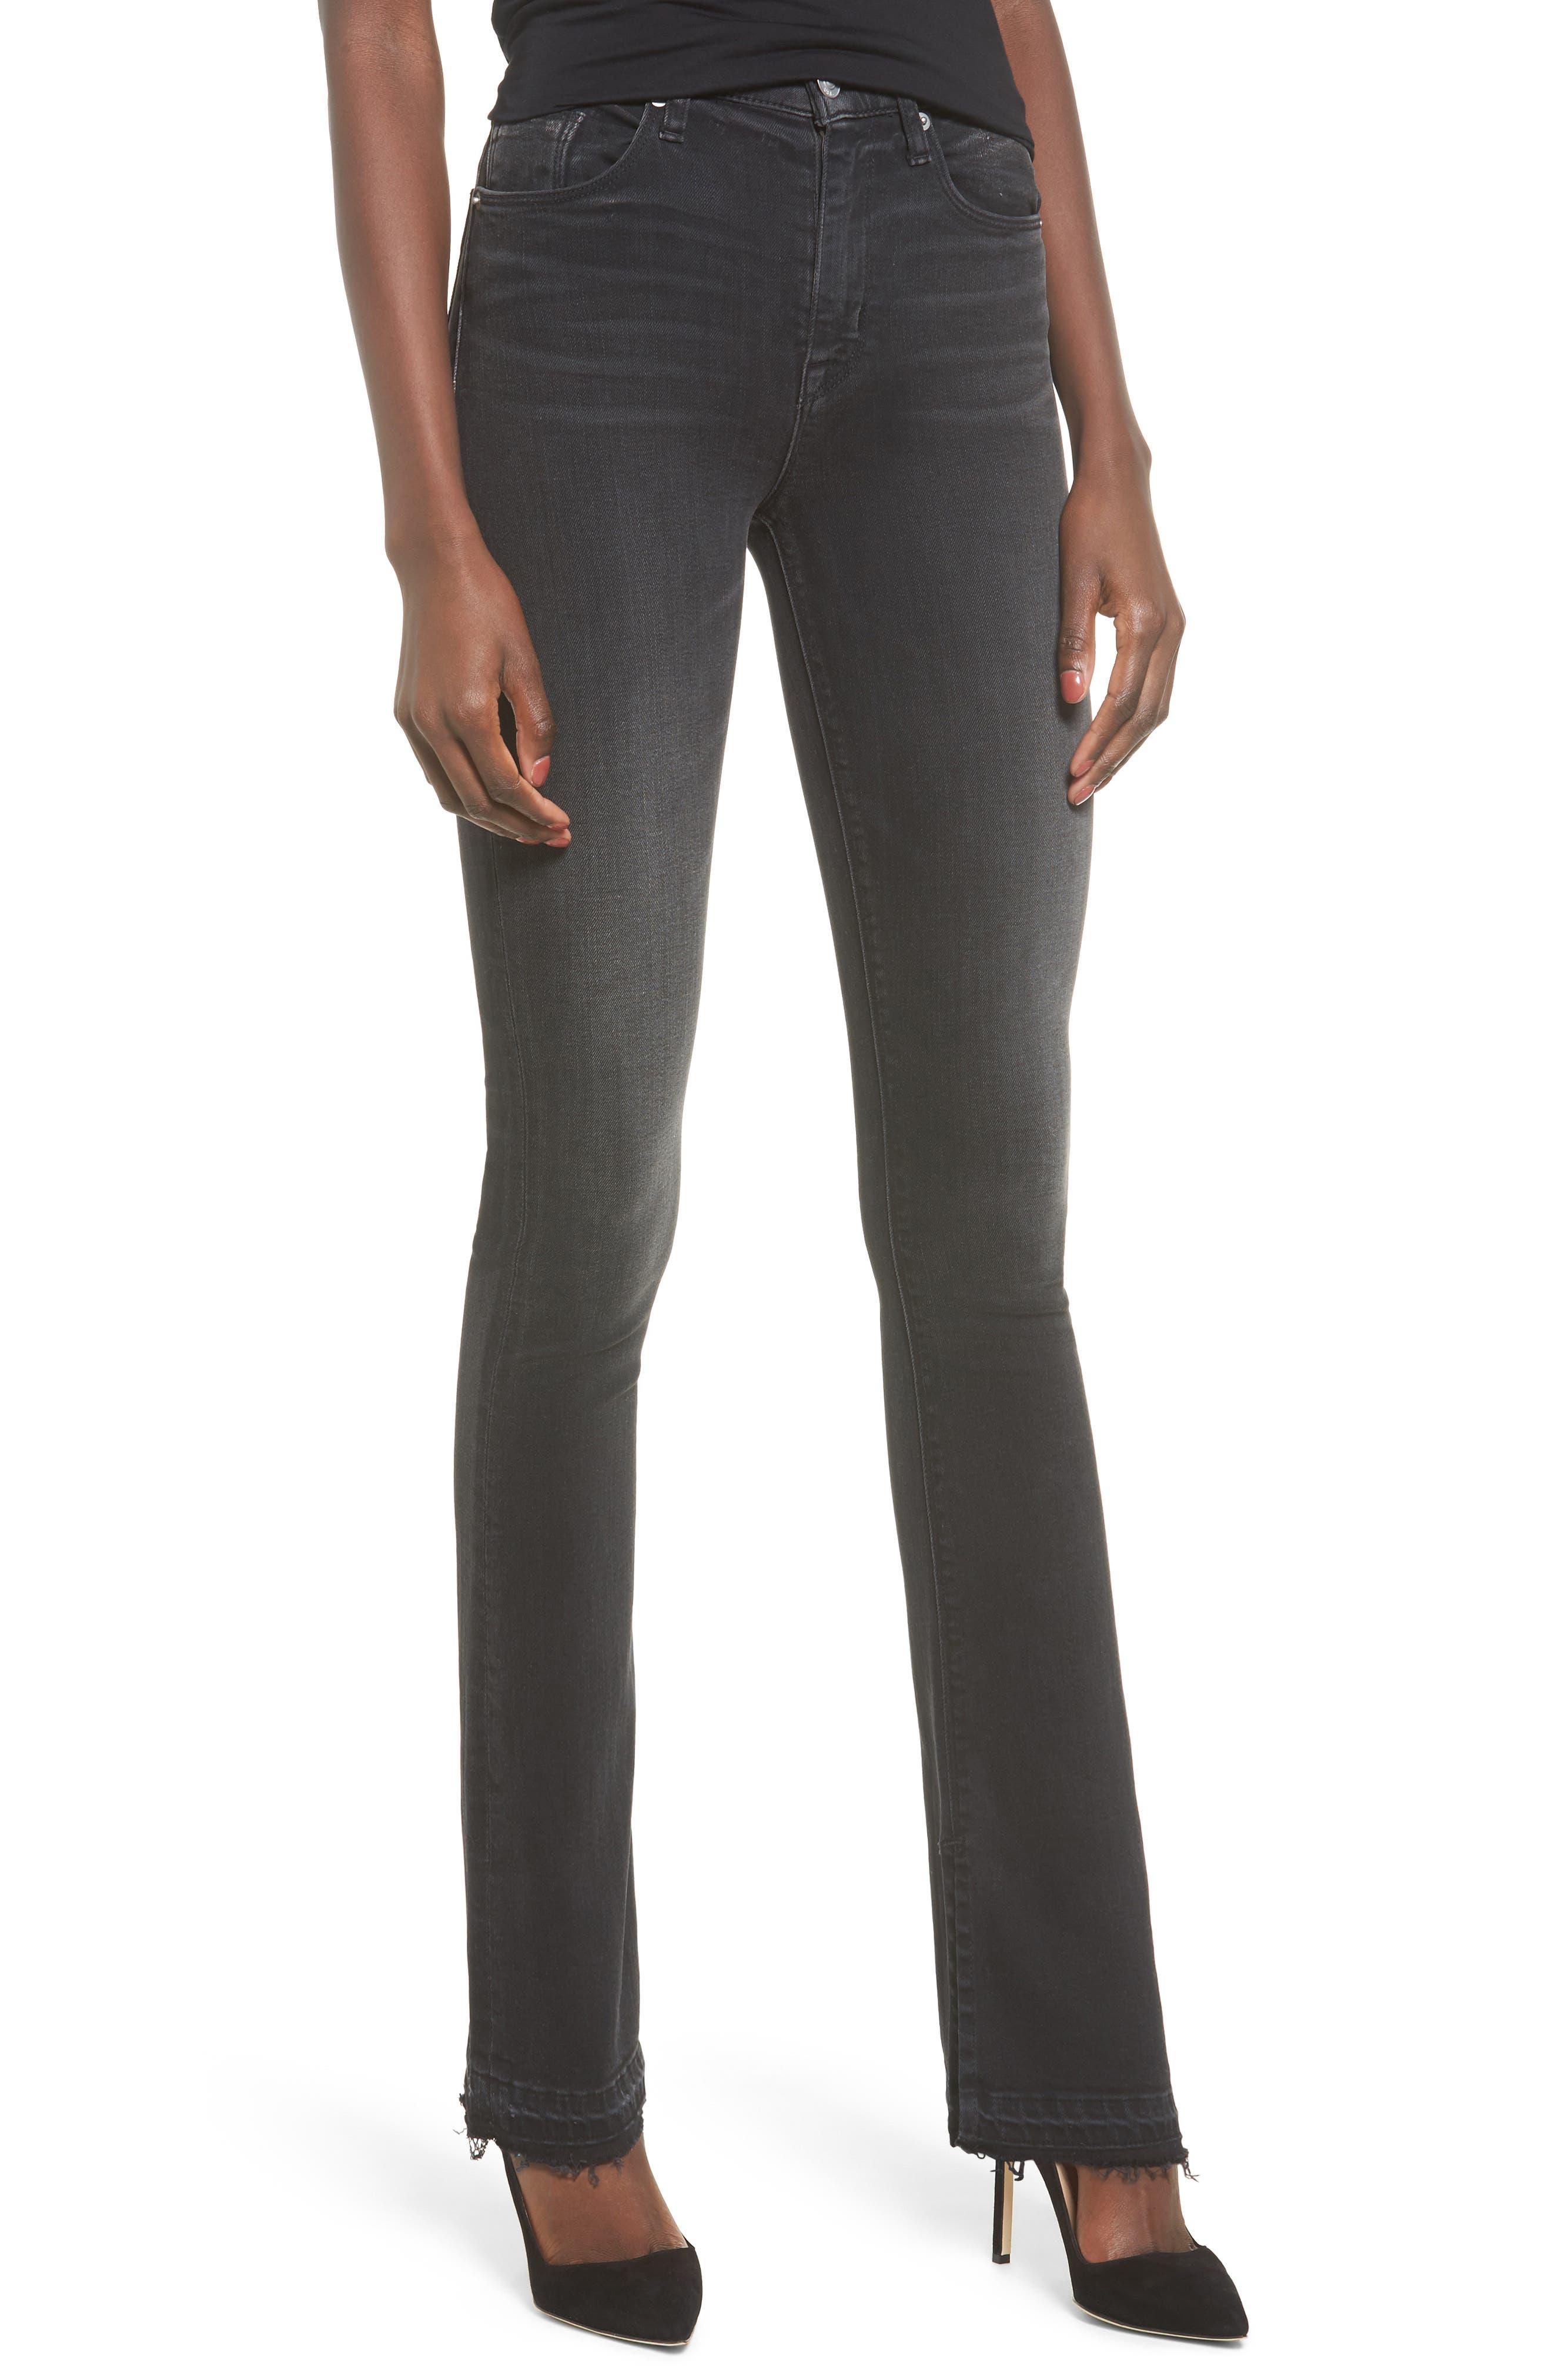 Main Image - Hudson Jeans Heartbreaker High Waist Bootcut Jeans (Abandon)